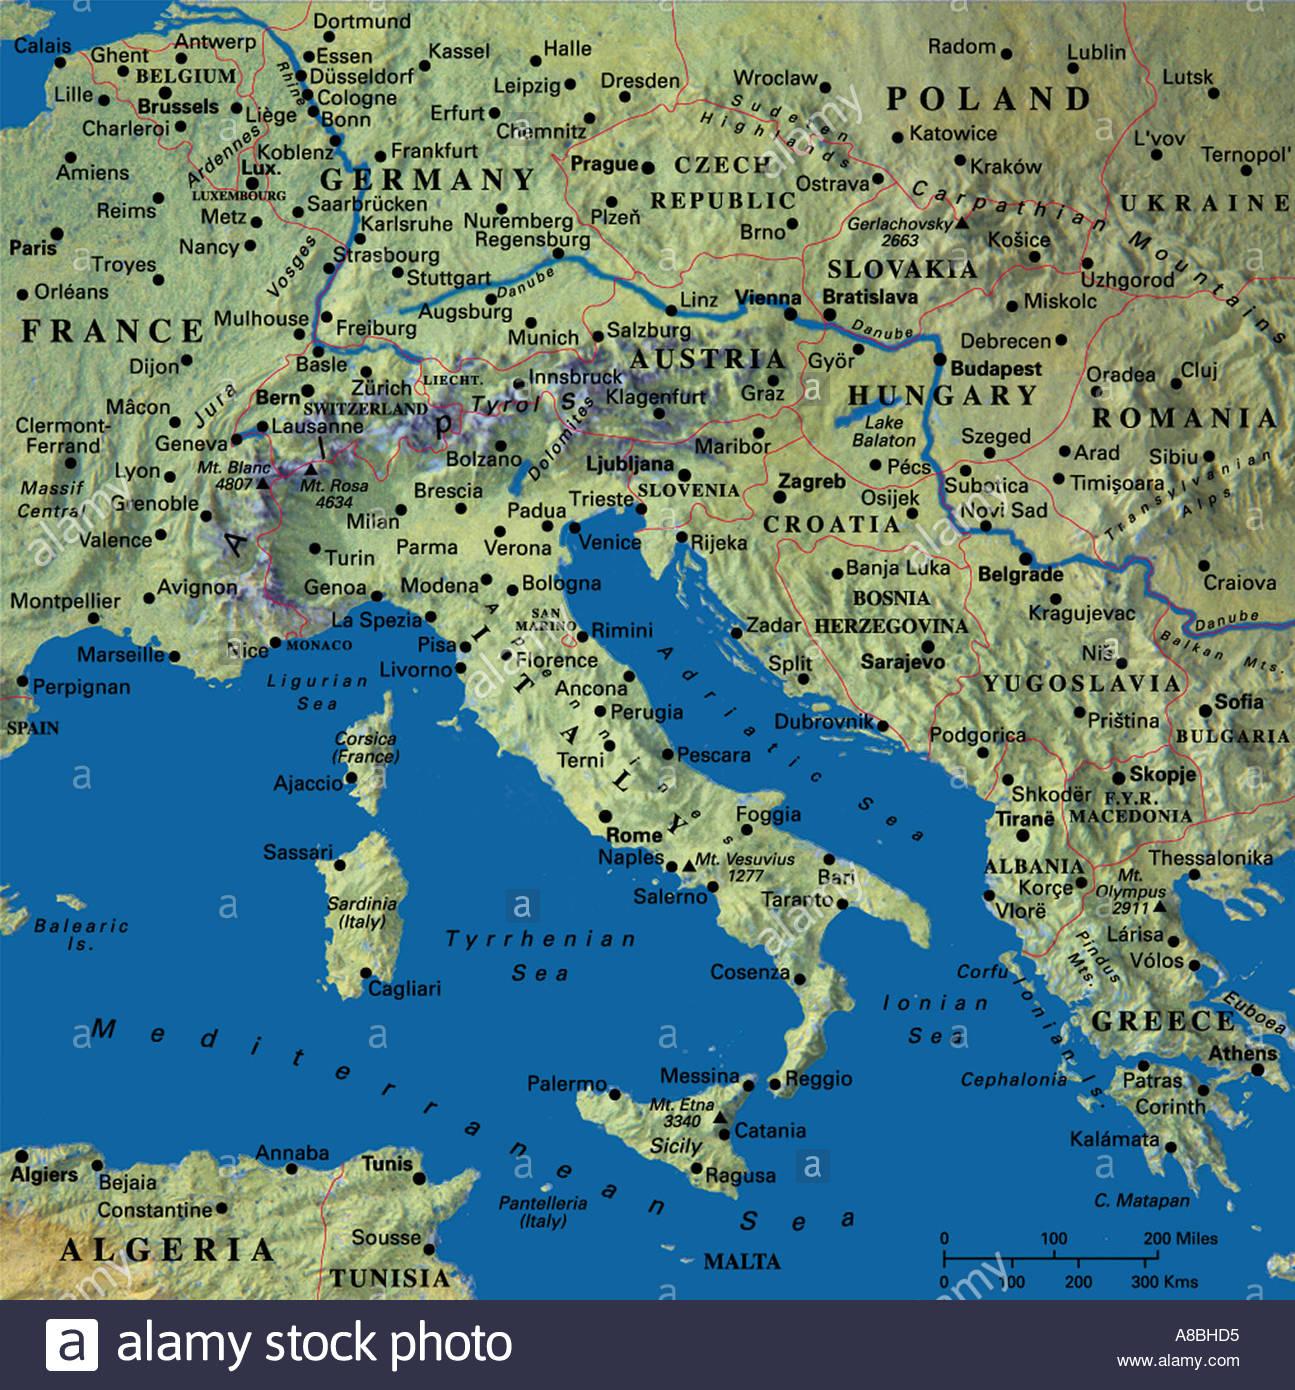 Map Maps Europe Italy Croatia Stock Photos  Map Maps Europe Italy